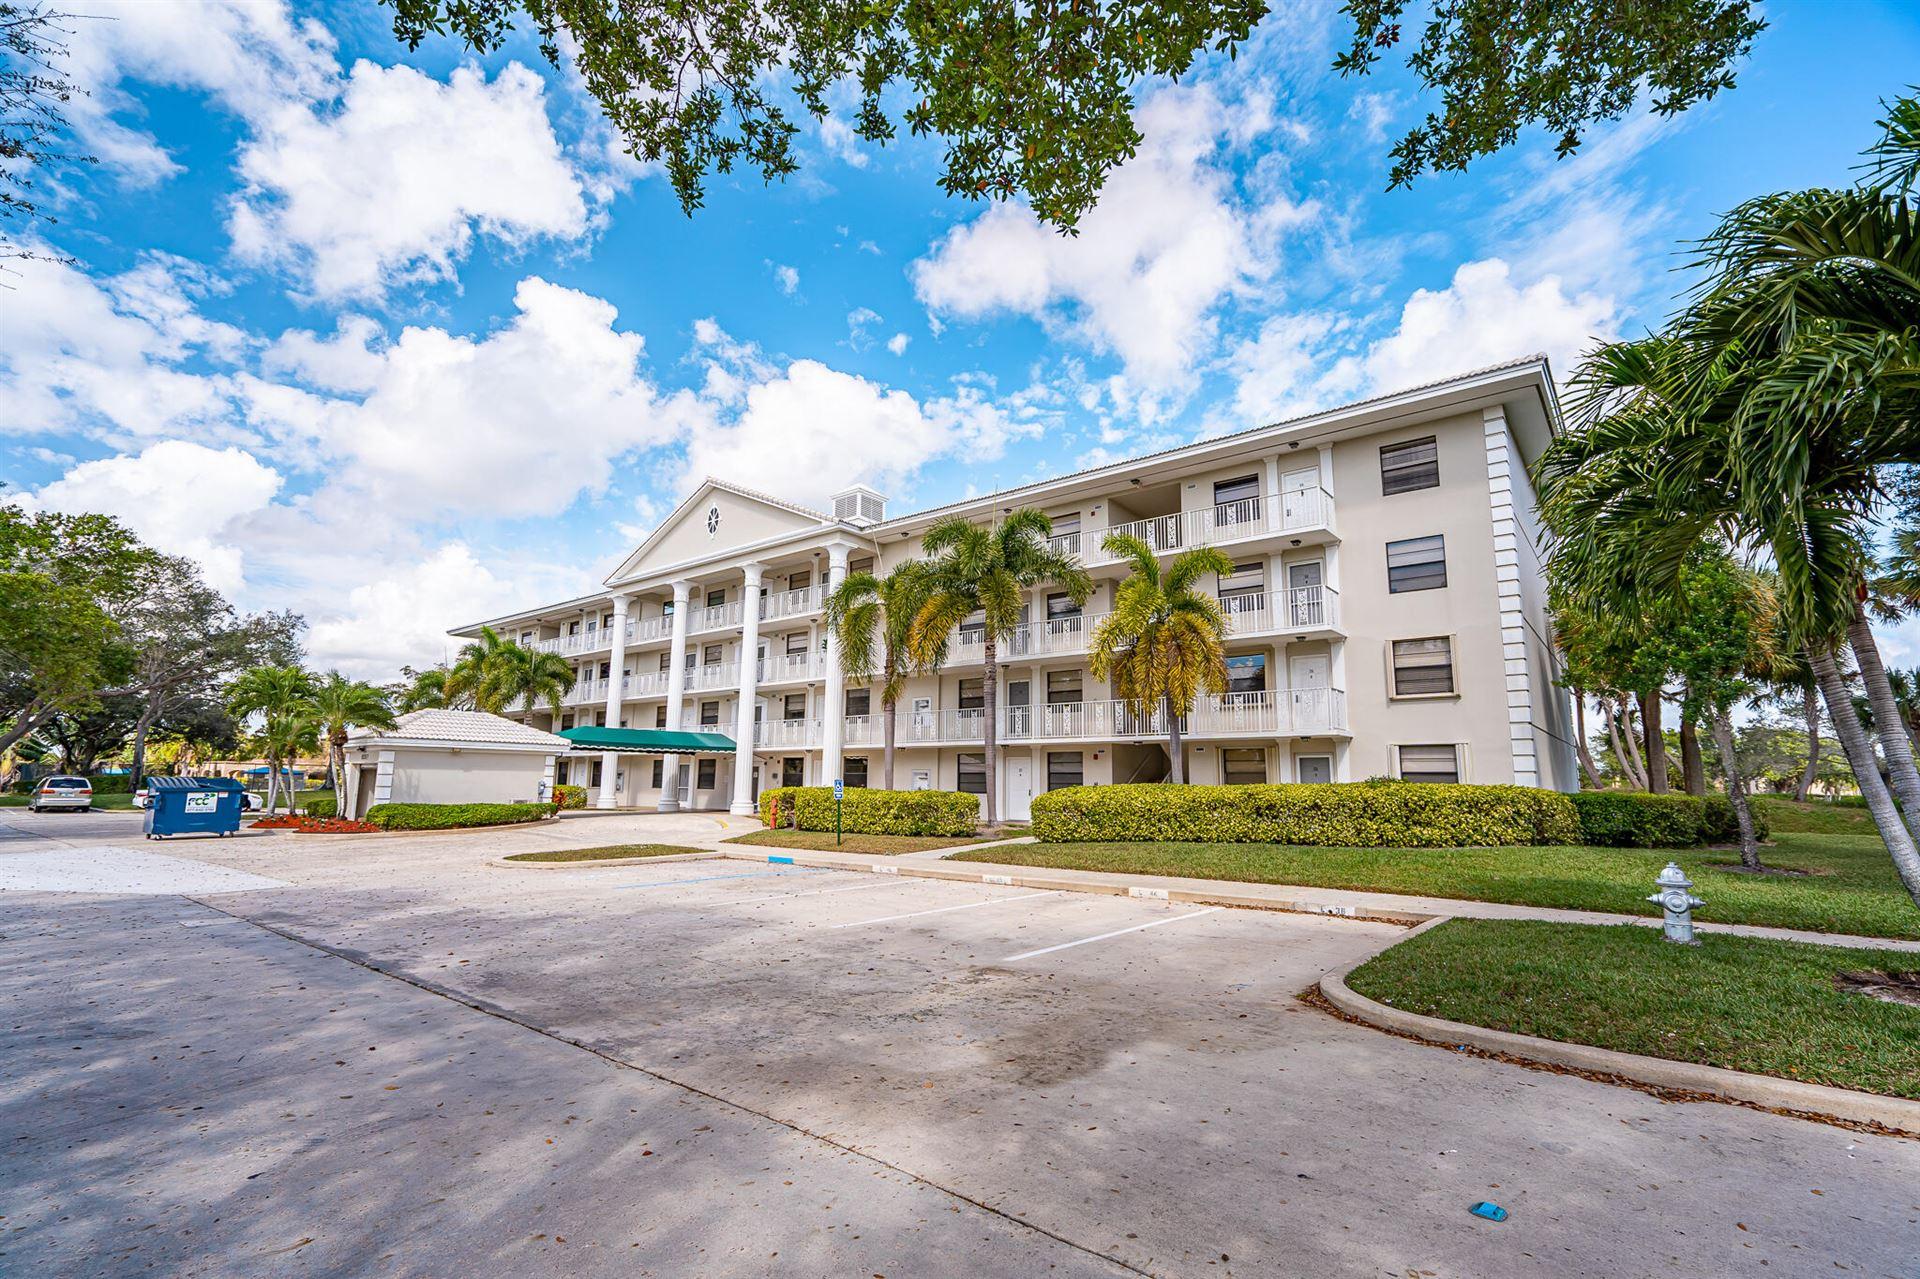 6097 Balboa Circle #202, Boca Raton, FL 33433 - #: RX-10692352